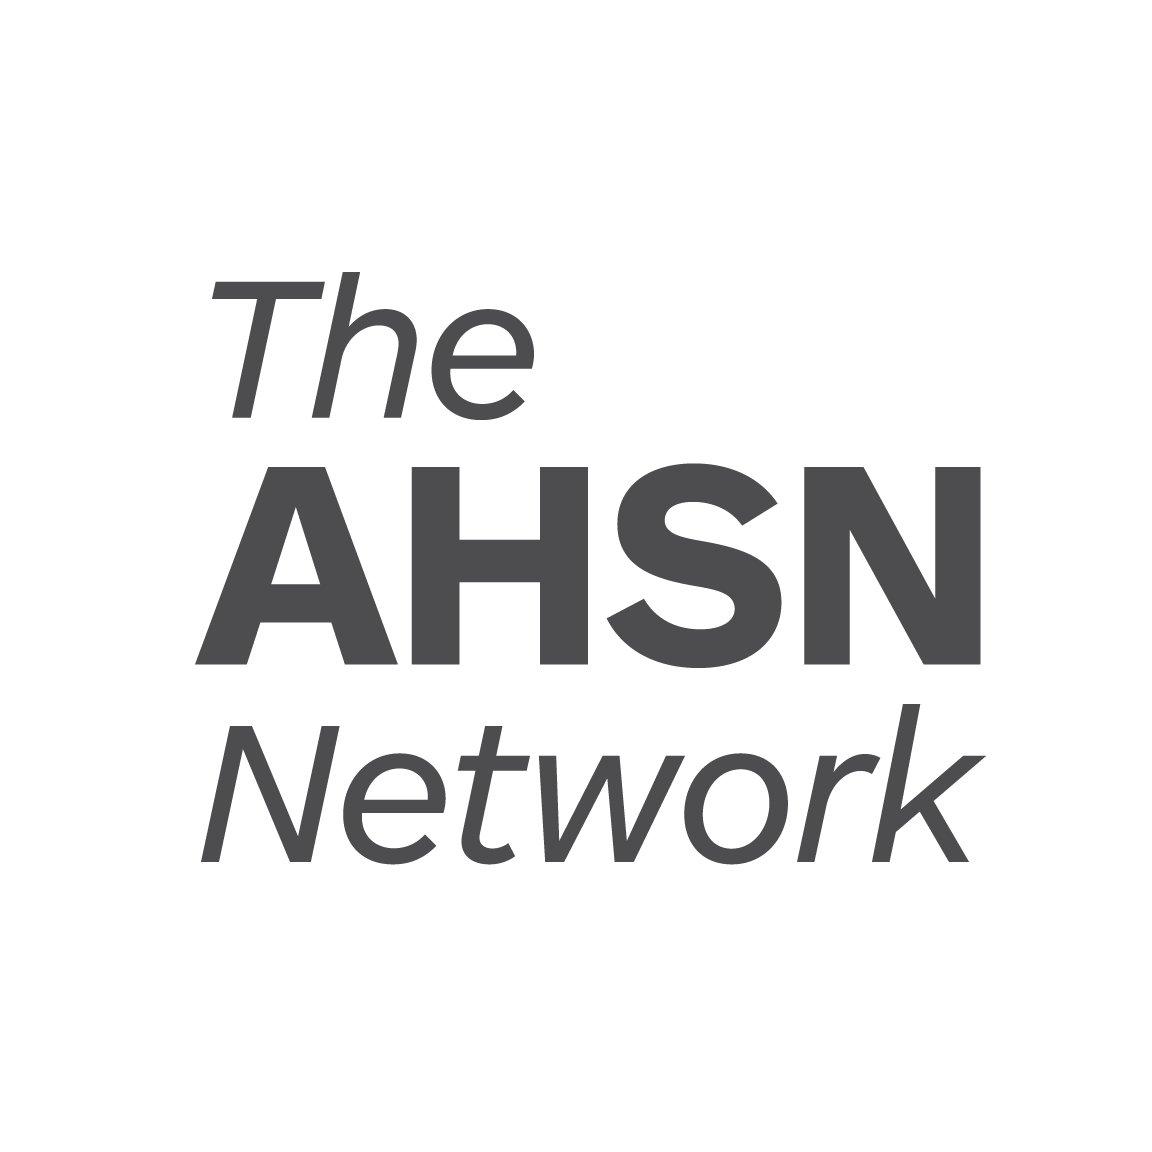 The AHSN Network